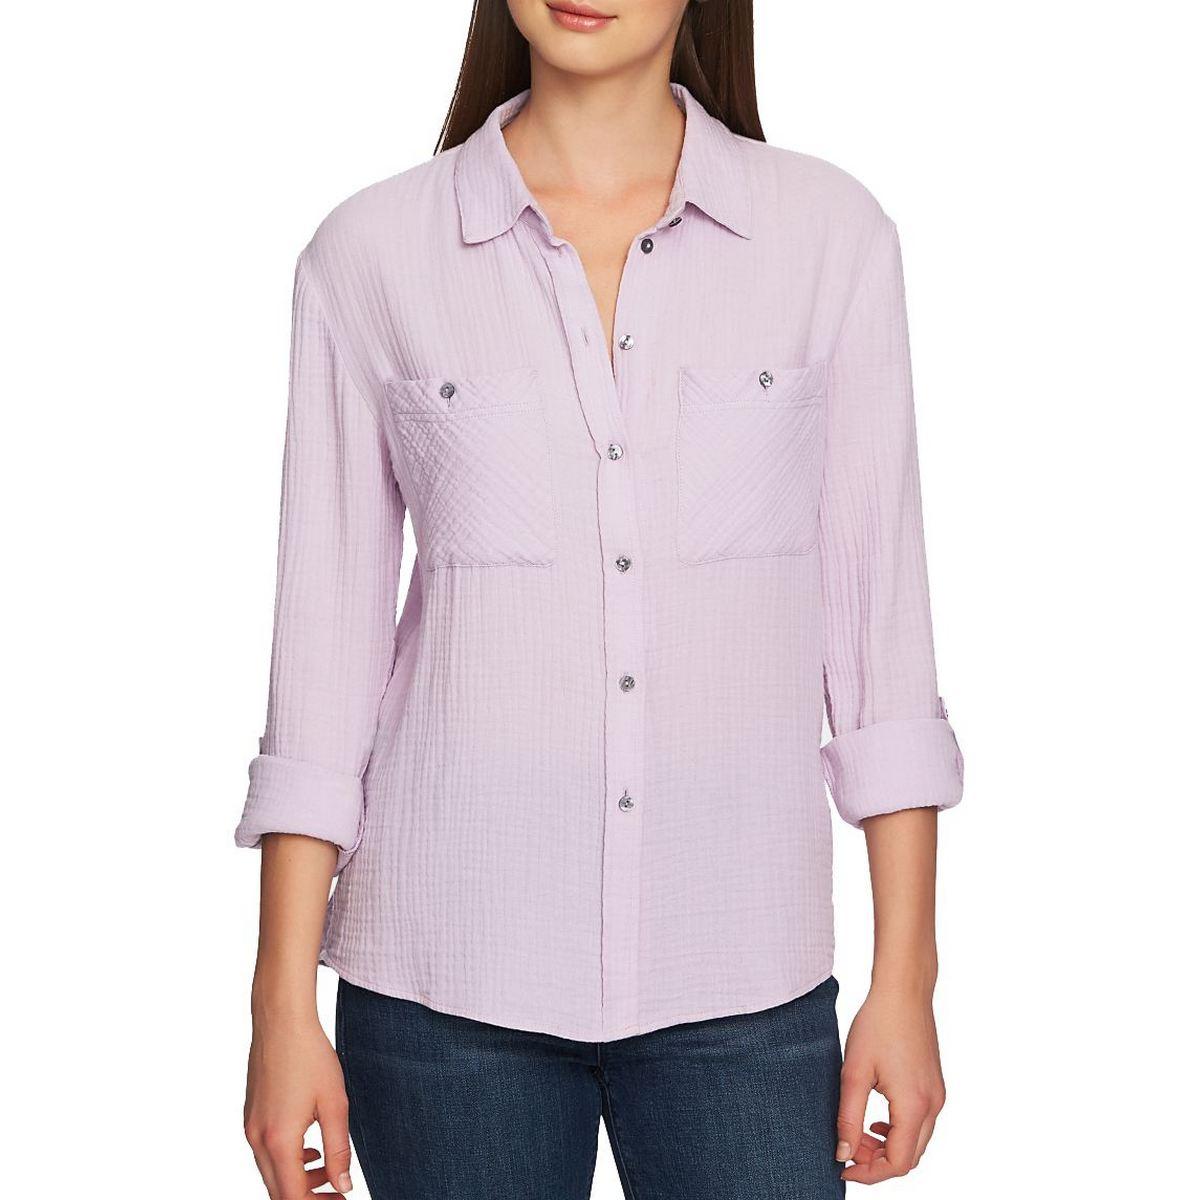 1 STATE NEW Women's Cotton Pocket Gauze Button Down Shirt Top TEDO